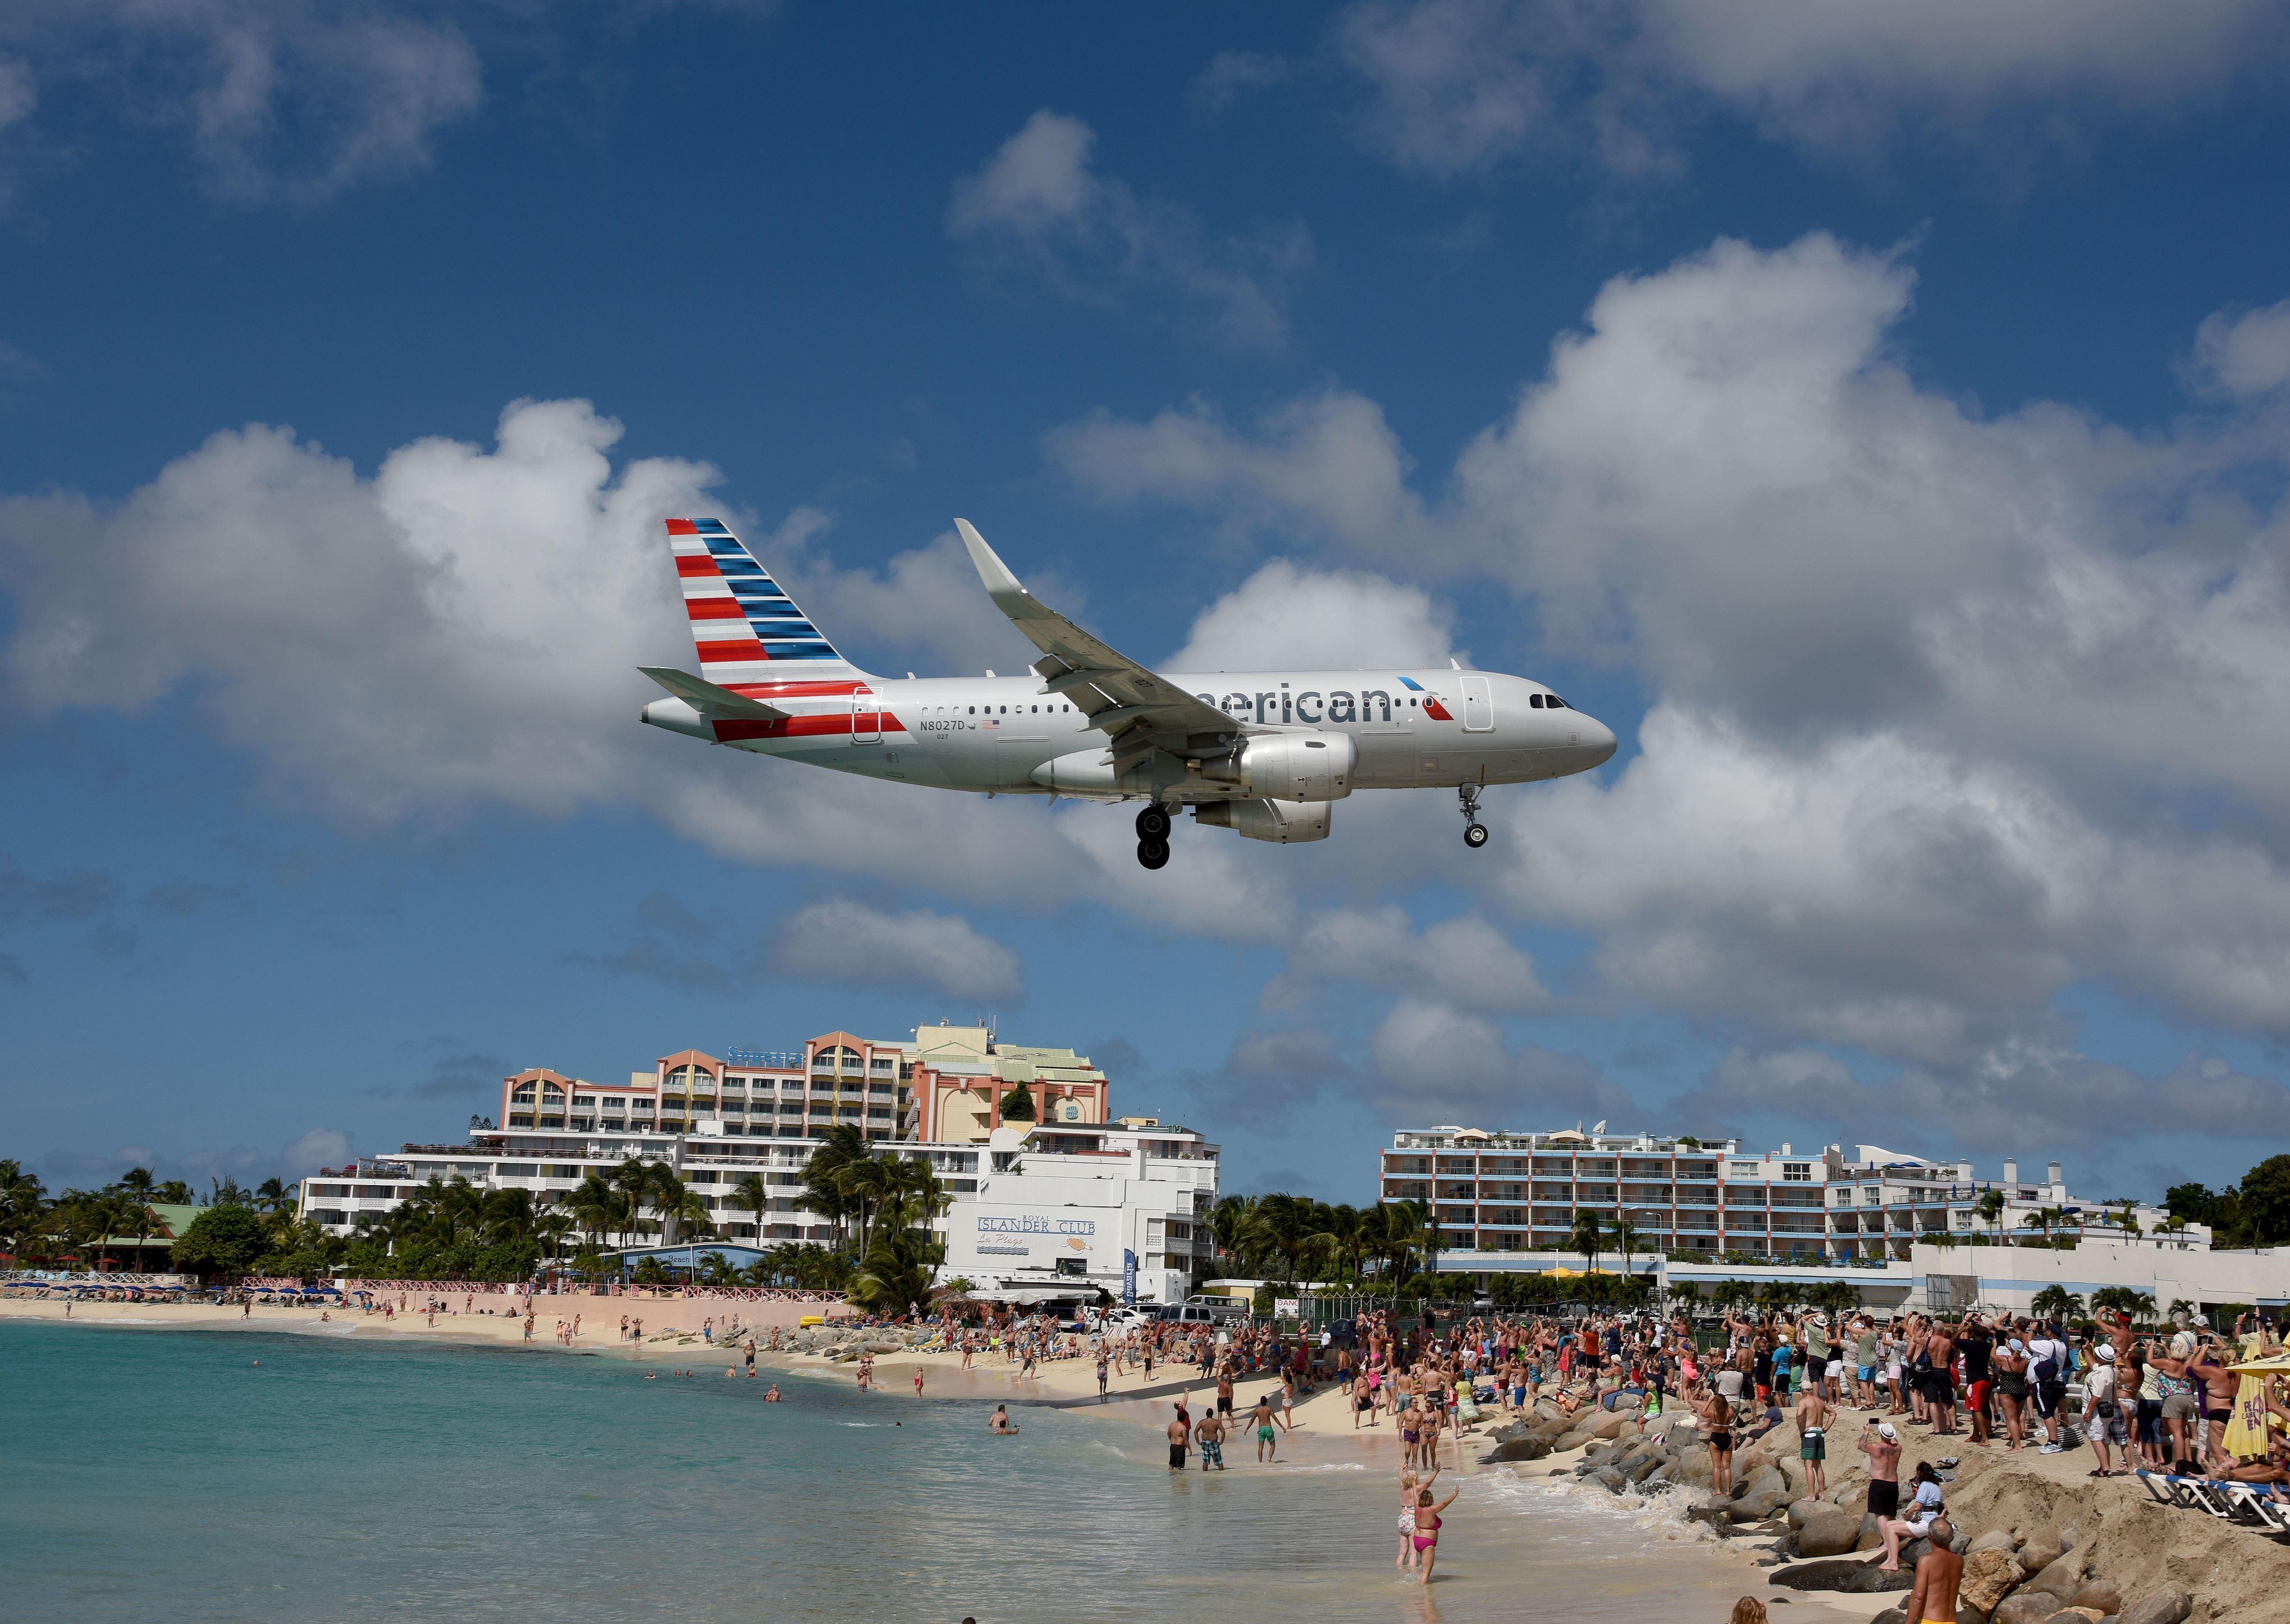 Slide 2 of 20: Maho Beach, Saint Maarten, West Indies - 16 Nov 2015 An American airlines flight from Miami arrives at Princess Juliana International airport in Saint Maarten